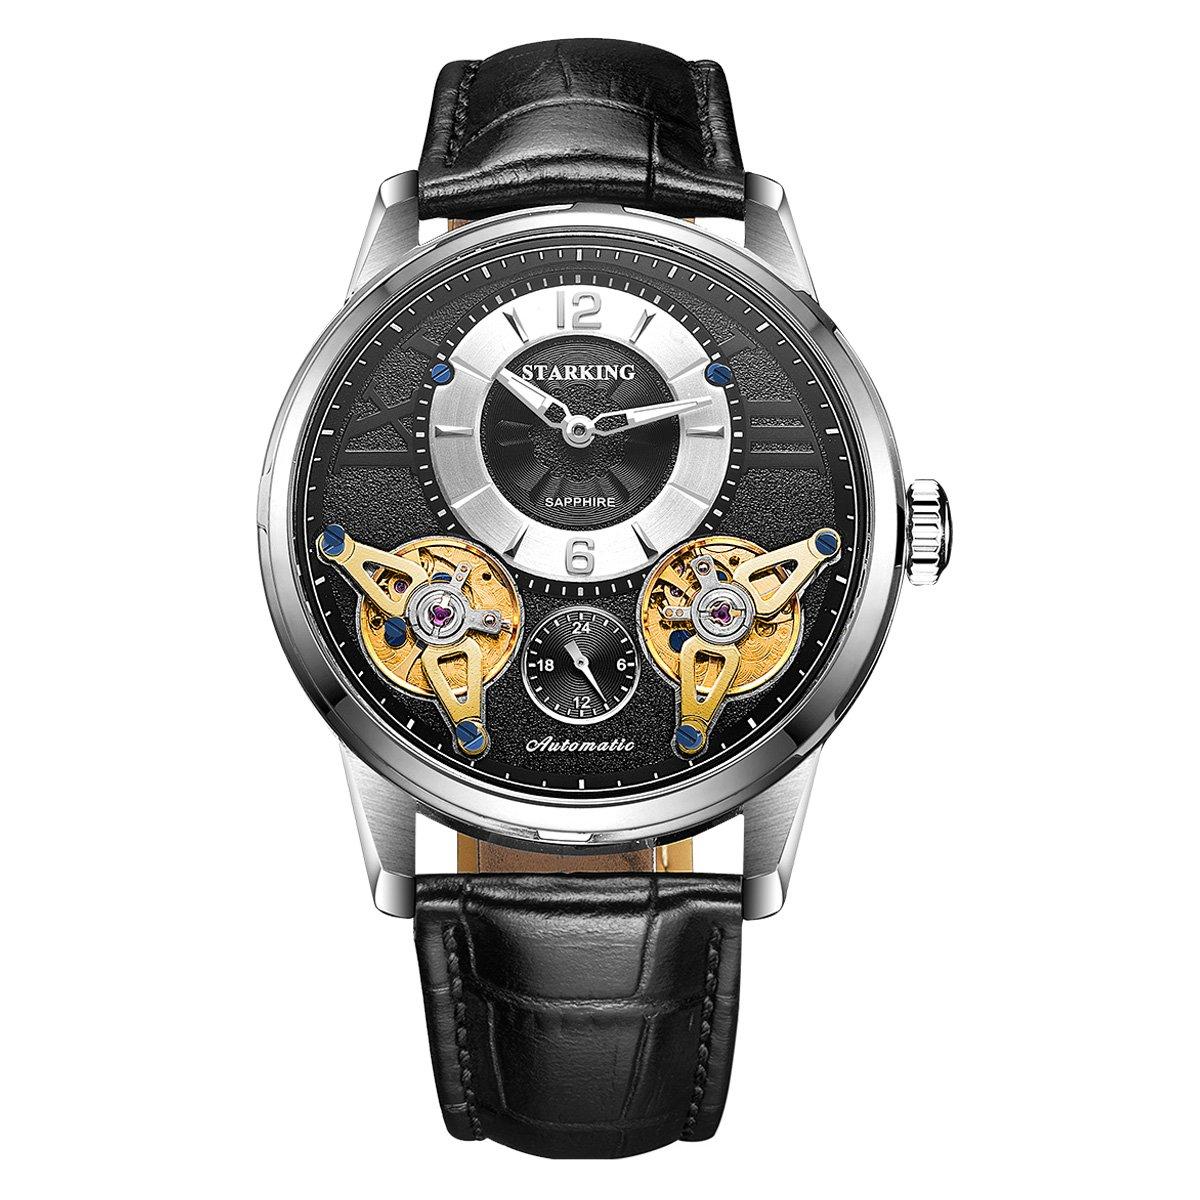 STARKING Tourbillon Automatic Watch Genuine Leather AM0222 Waterproof Men Mechanical Black with Subdial Sapphire Luminous Hands Skeleton